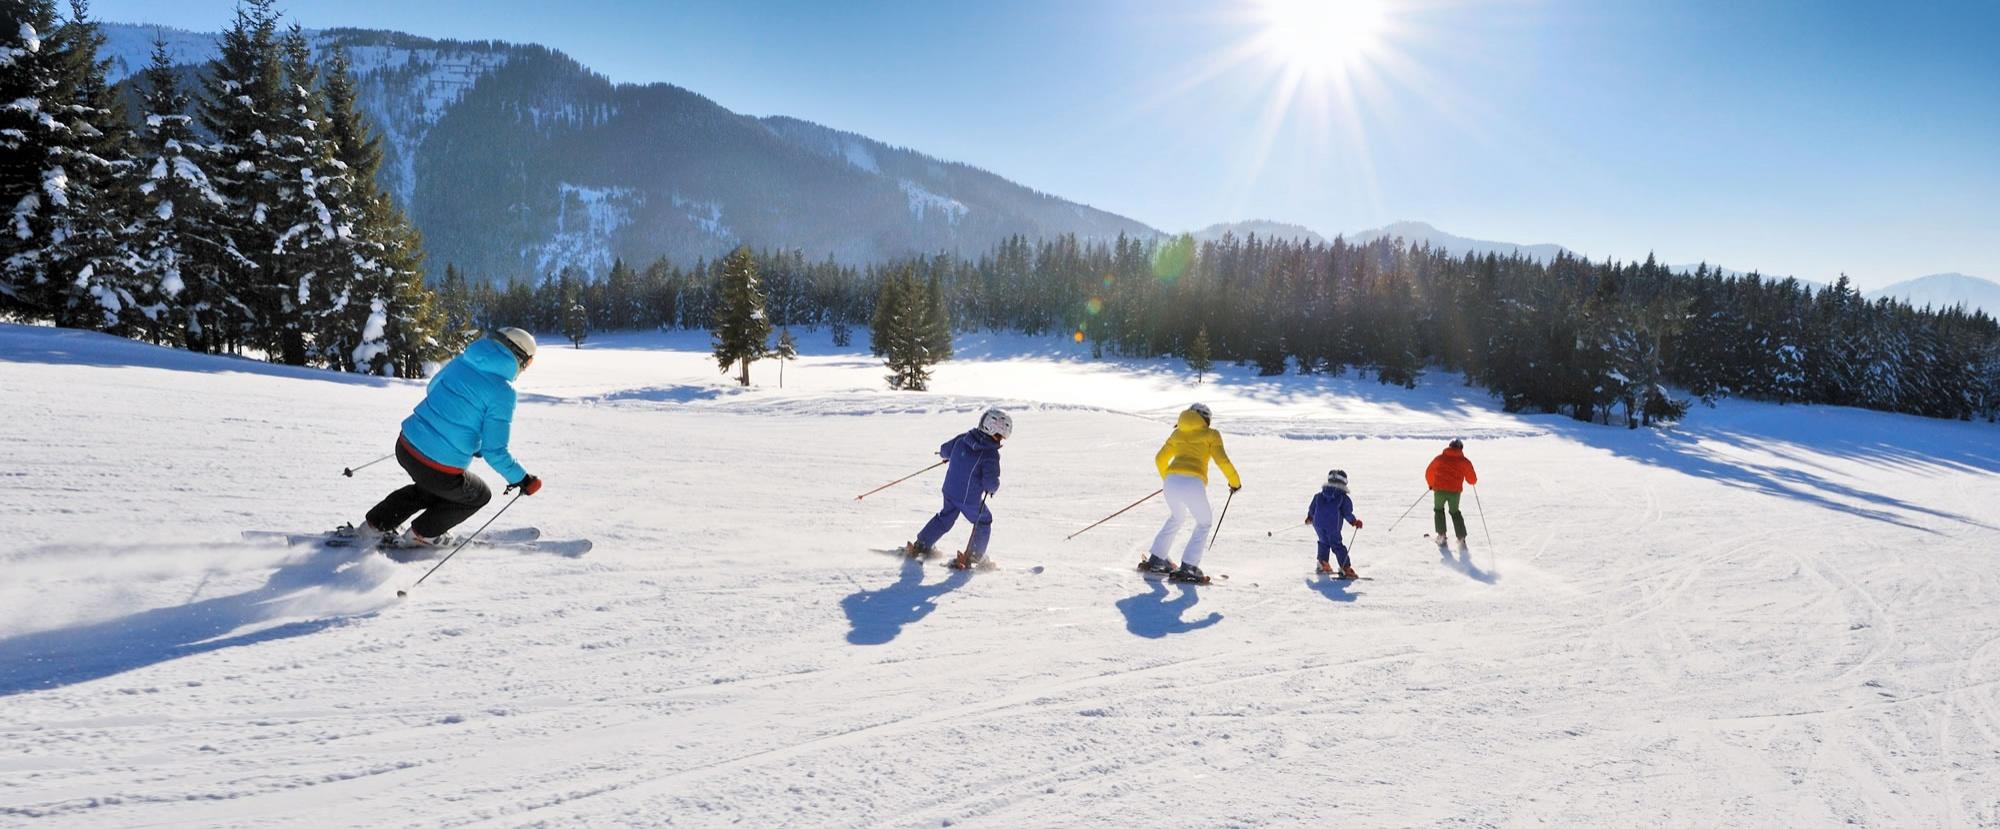 skiurlaub in ski amad alpenhotel wurzer filzmoos. Black Bedroom Furniture Sets. Home Design Ideas